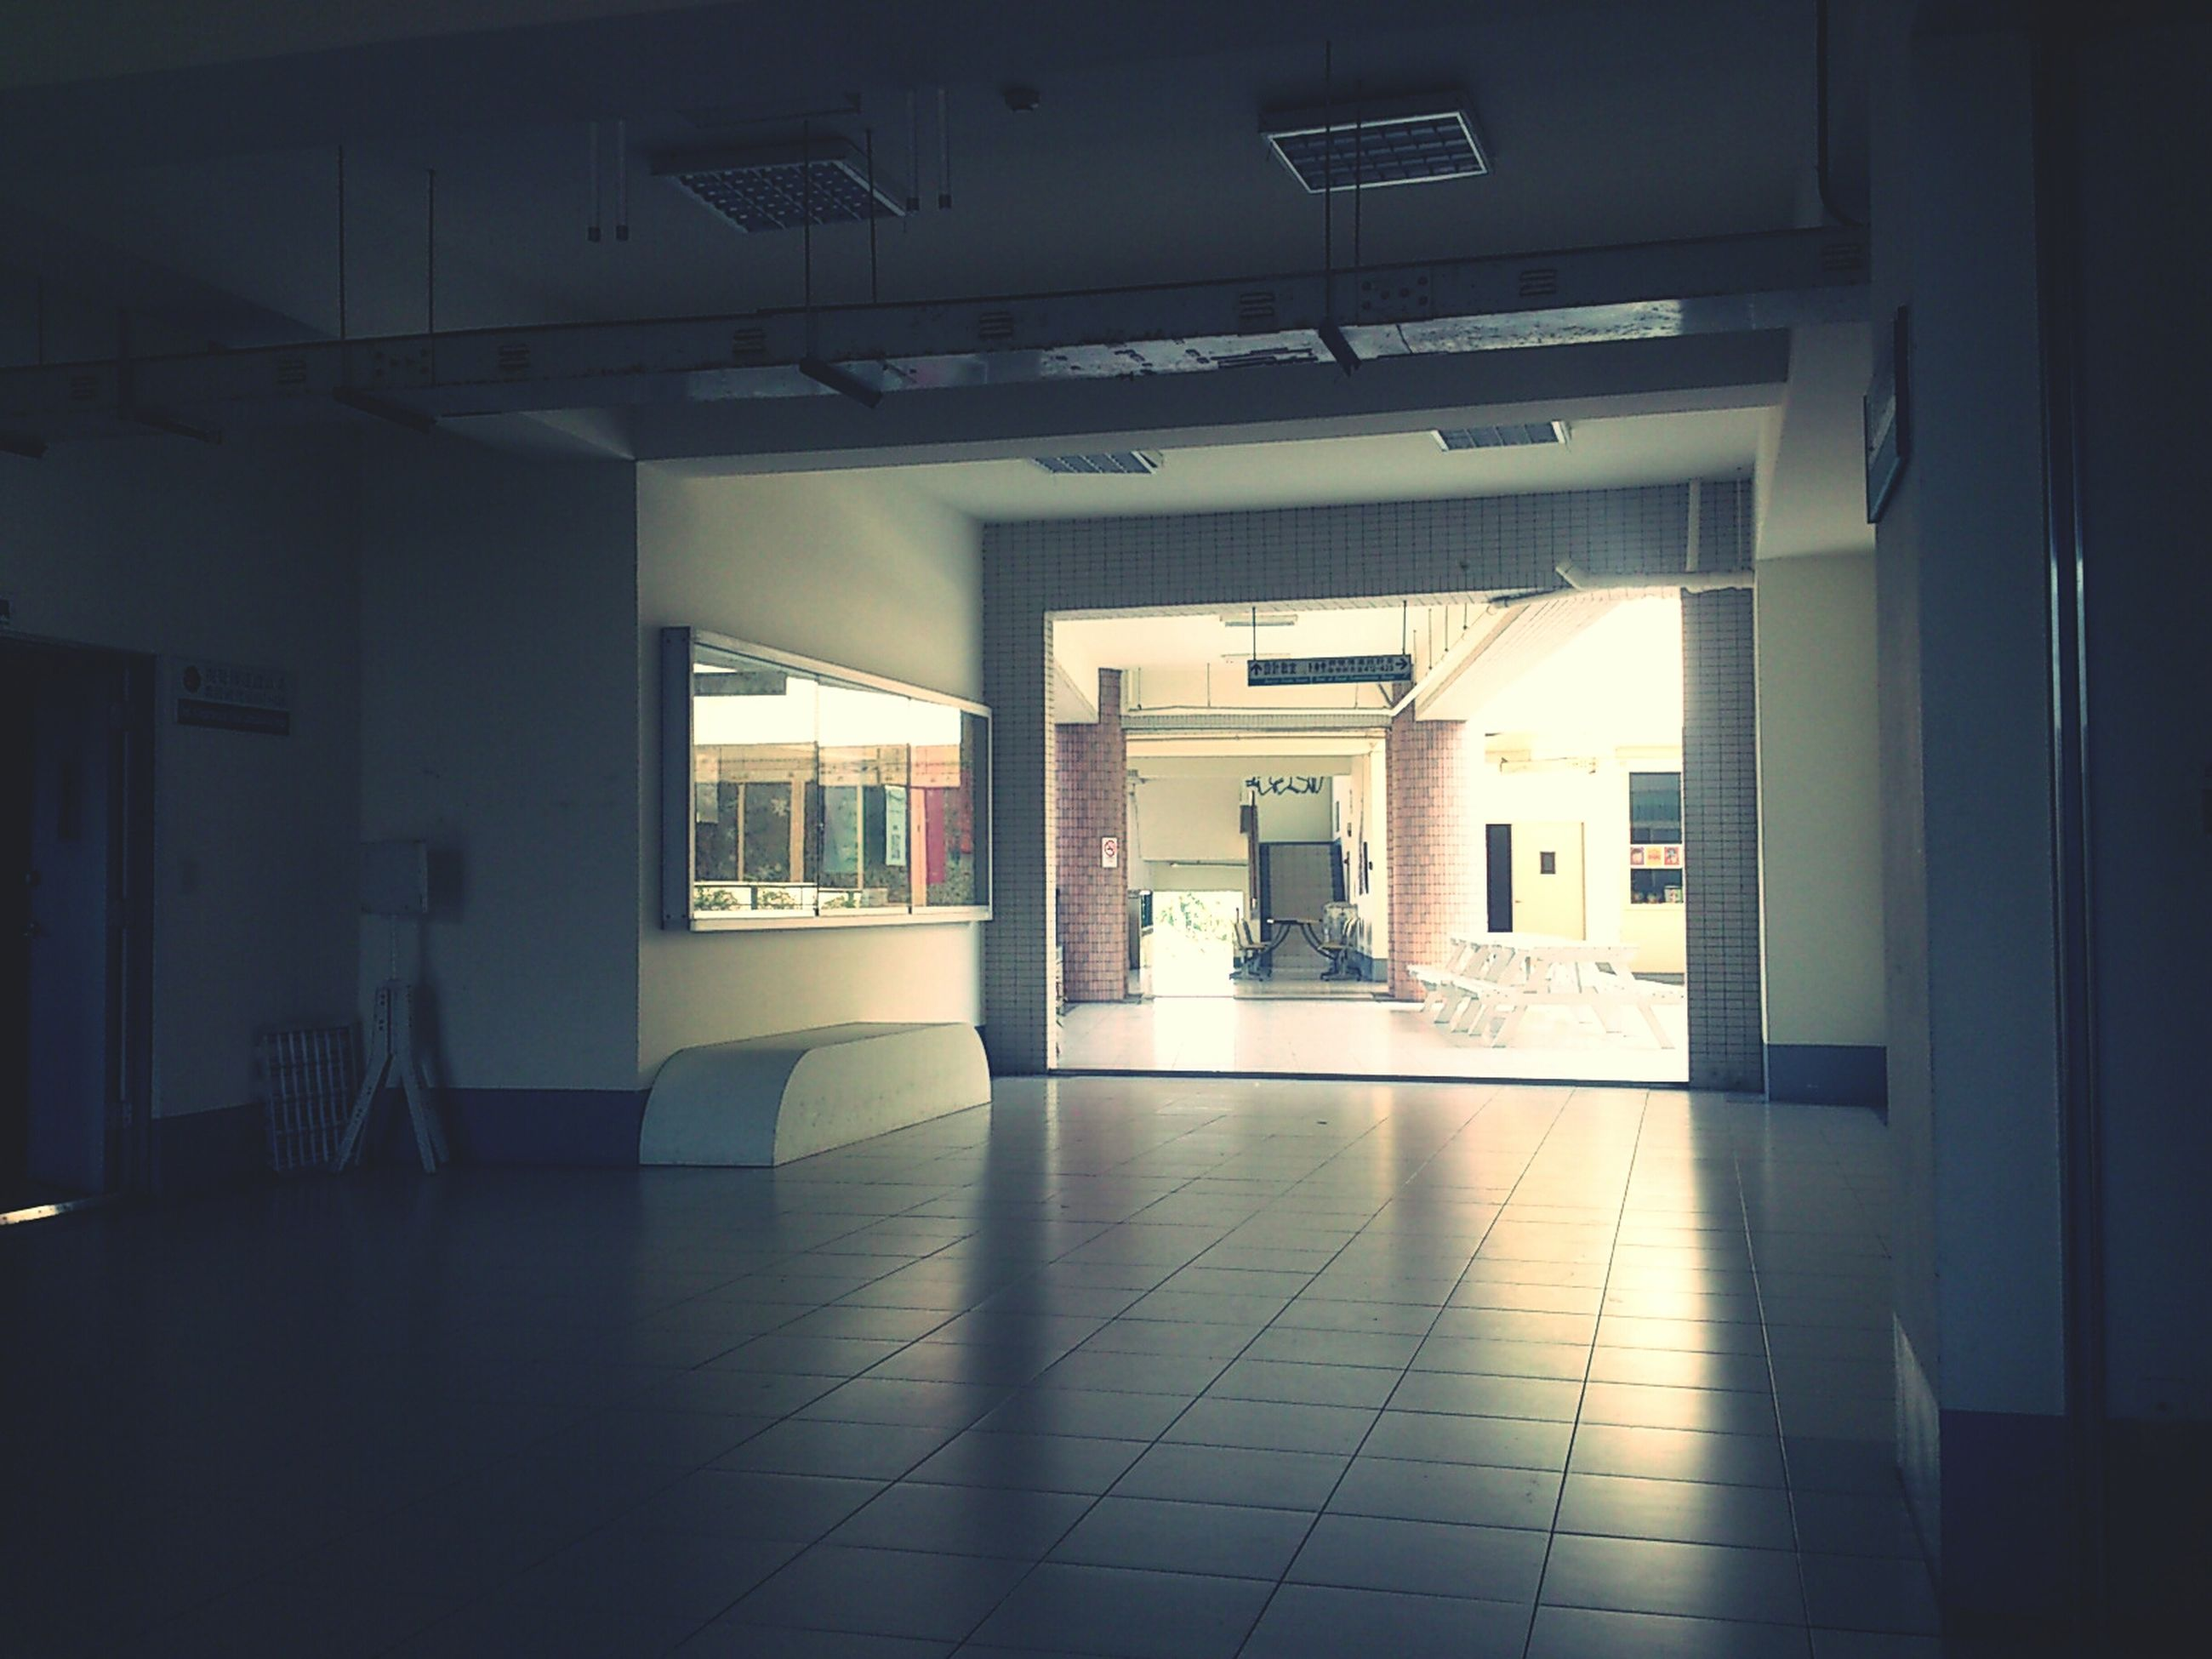 indoors, ceiling, architecture, empty, built structure, corridor, flooring, absence, interior, illuminated, window, tiled floor, door, lighting equipment, chair, no people, building, the way forward, reflection, modern